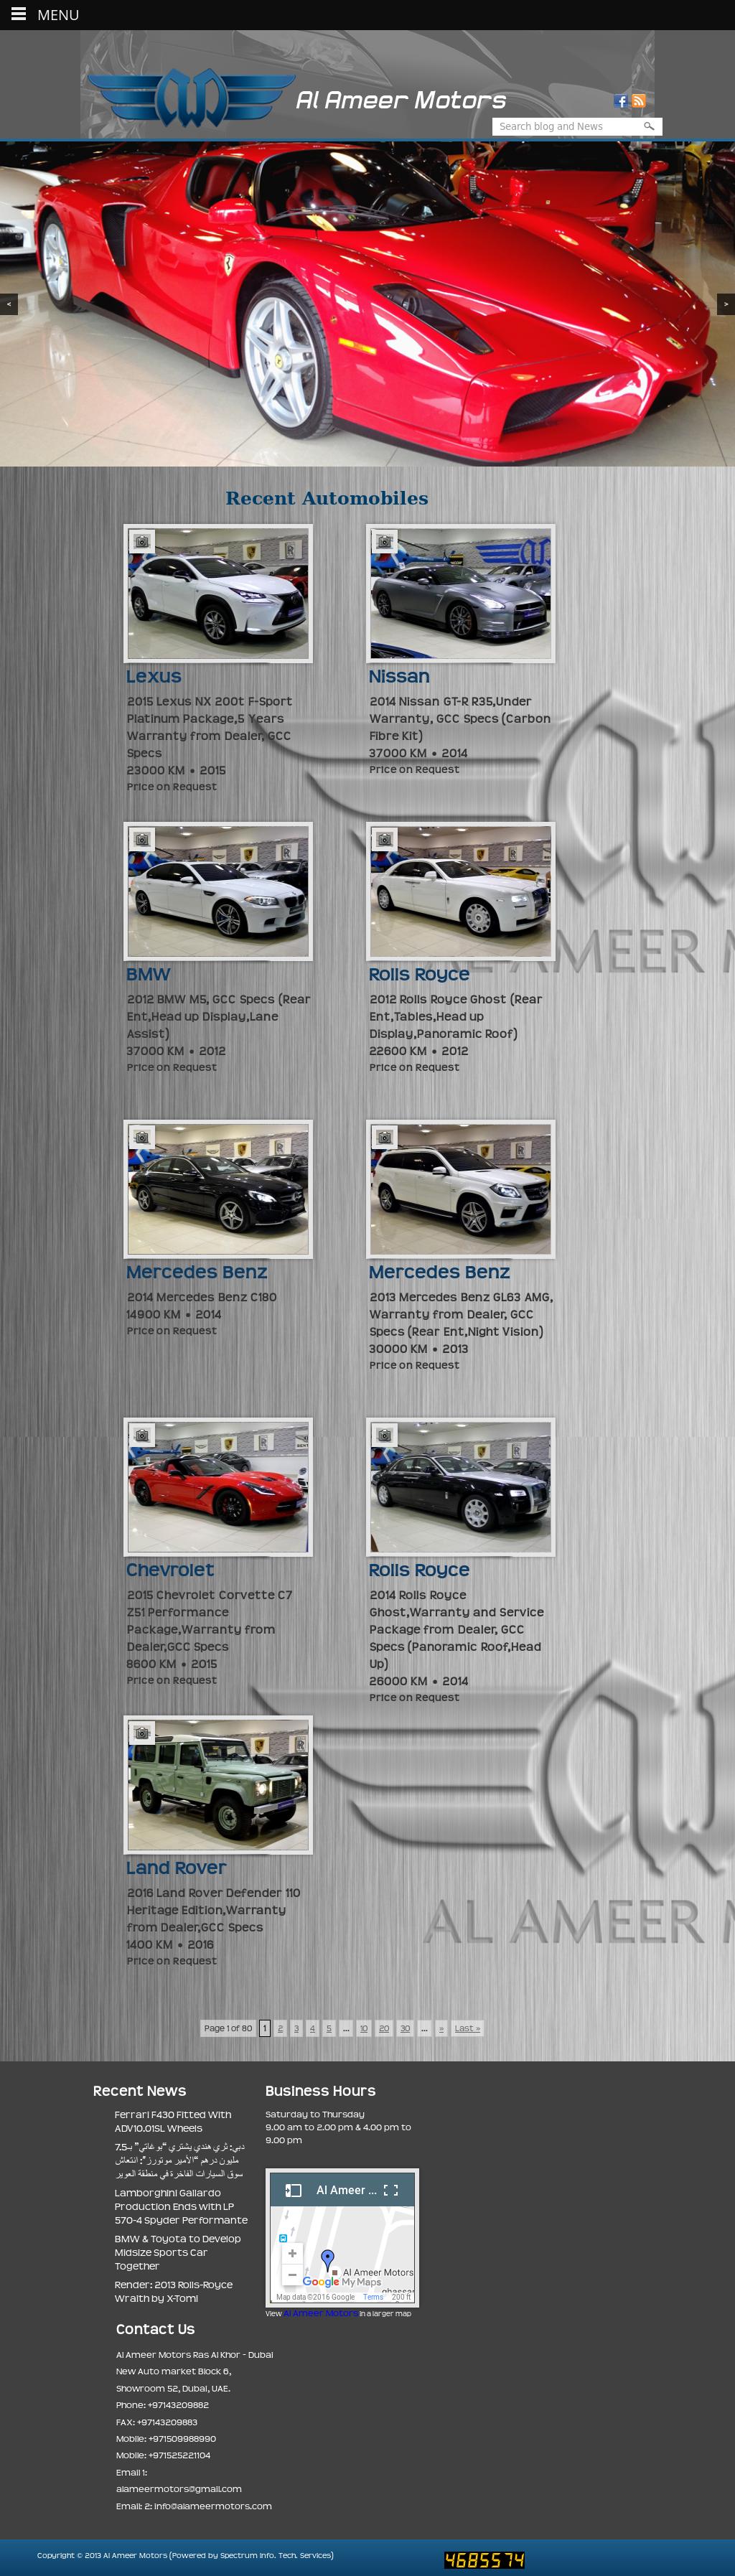 Al Ameer Motors Competitors, Revenue and Employees - Owler Company Profile